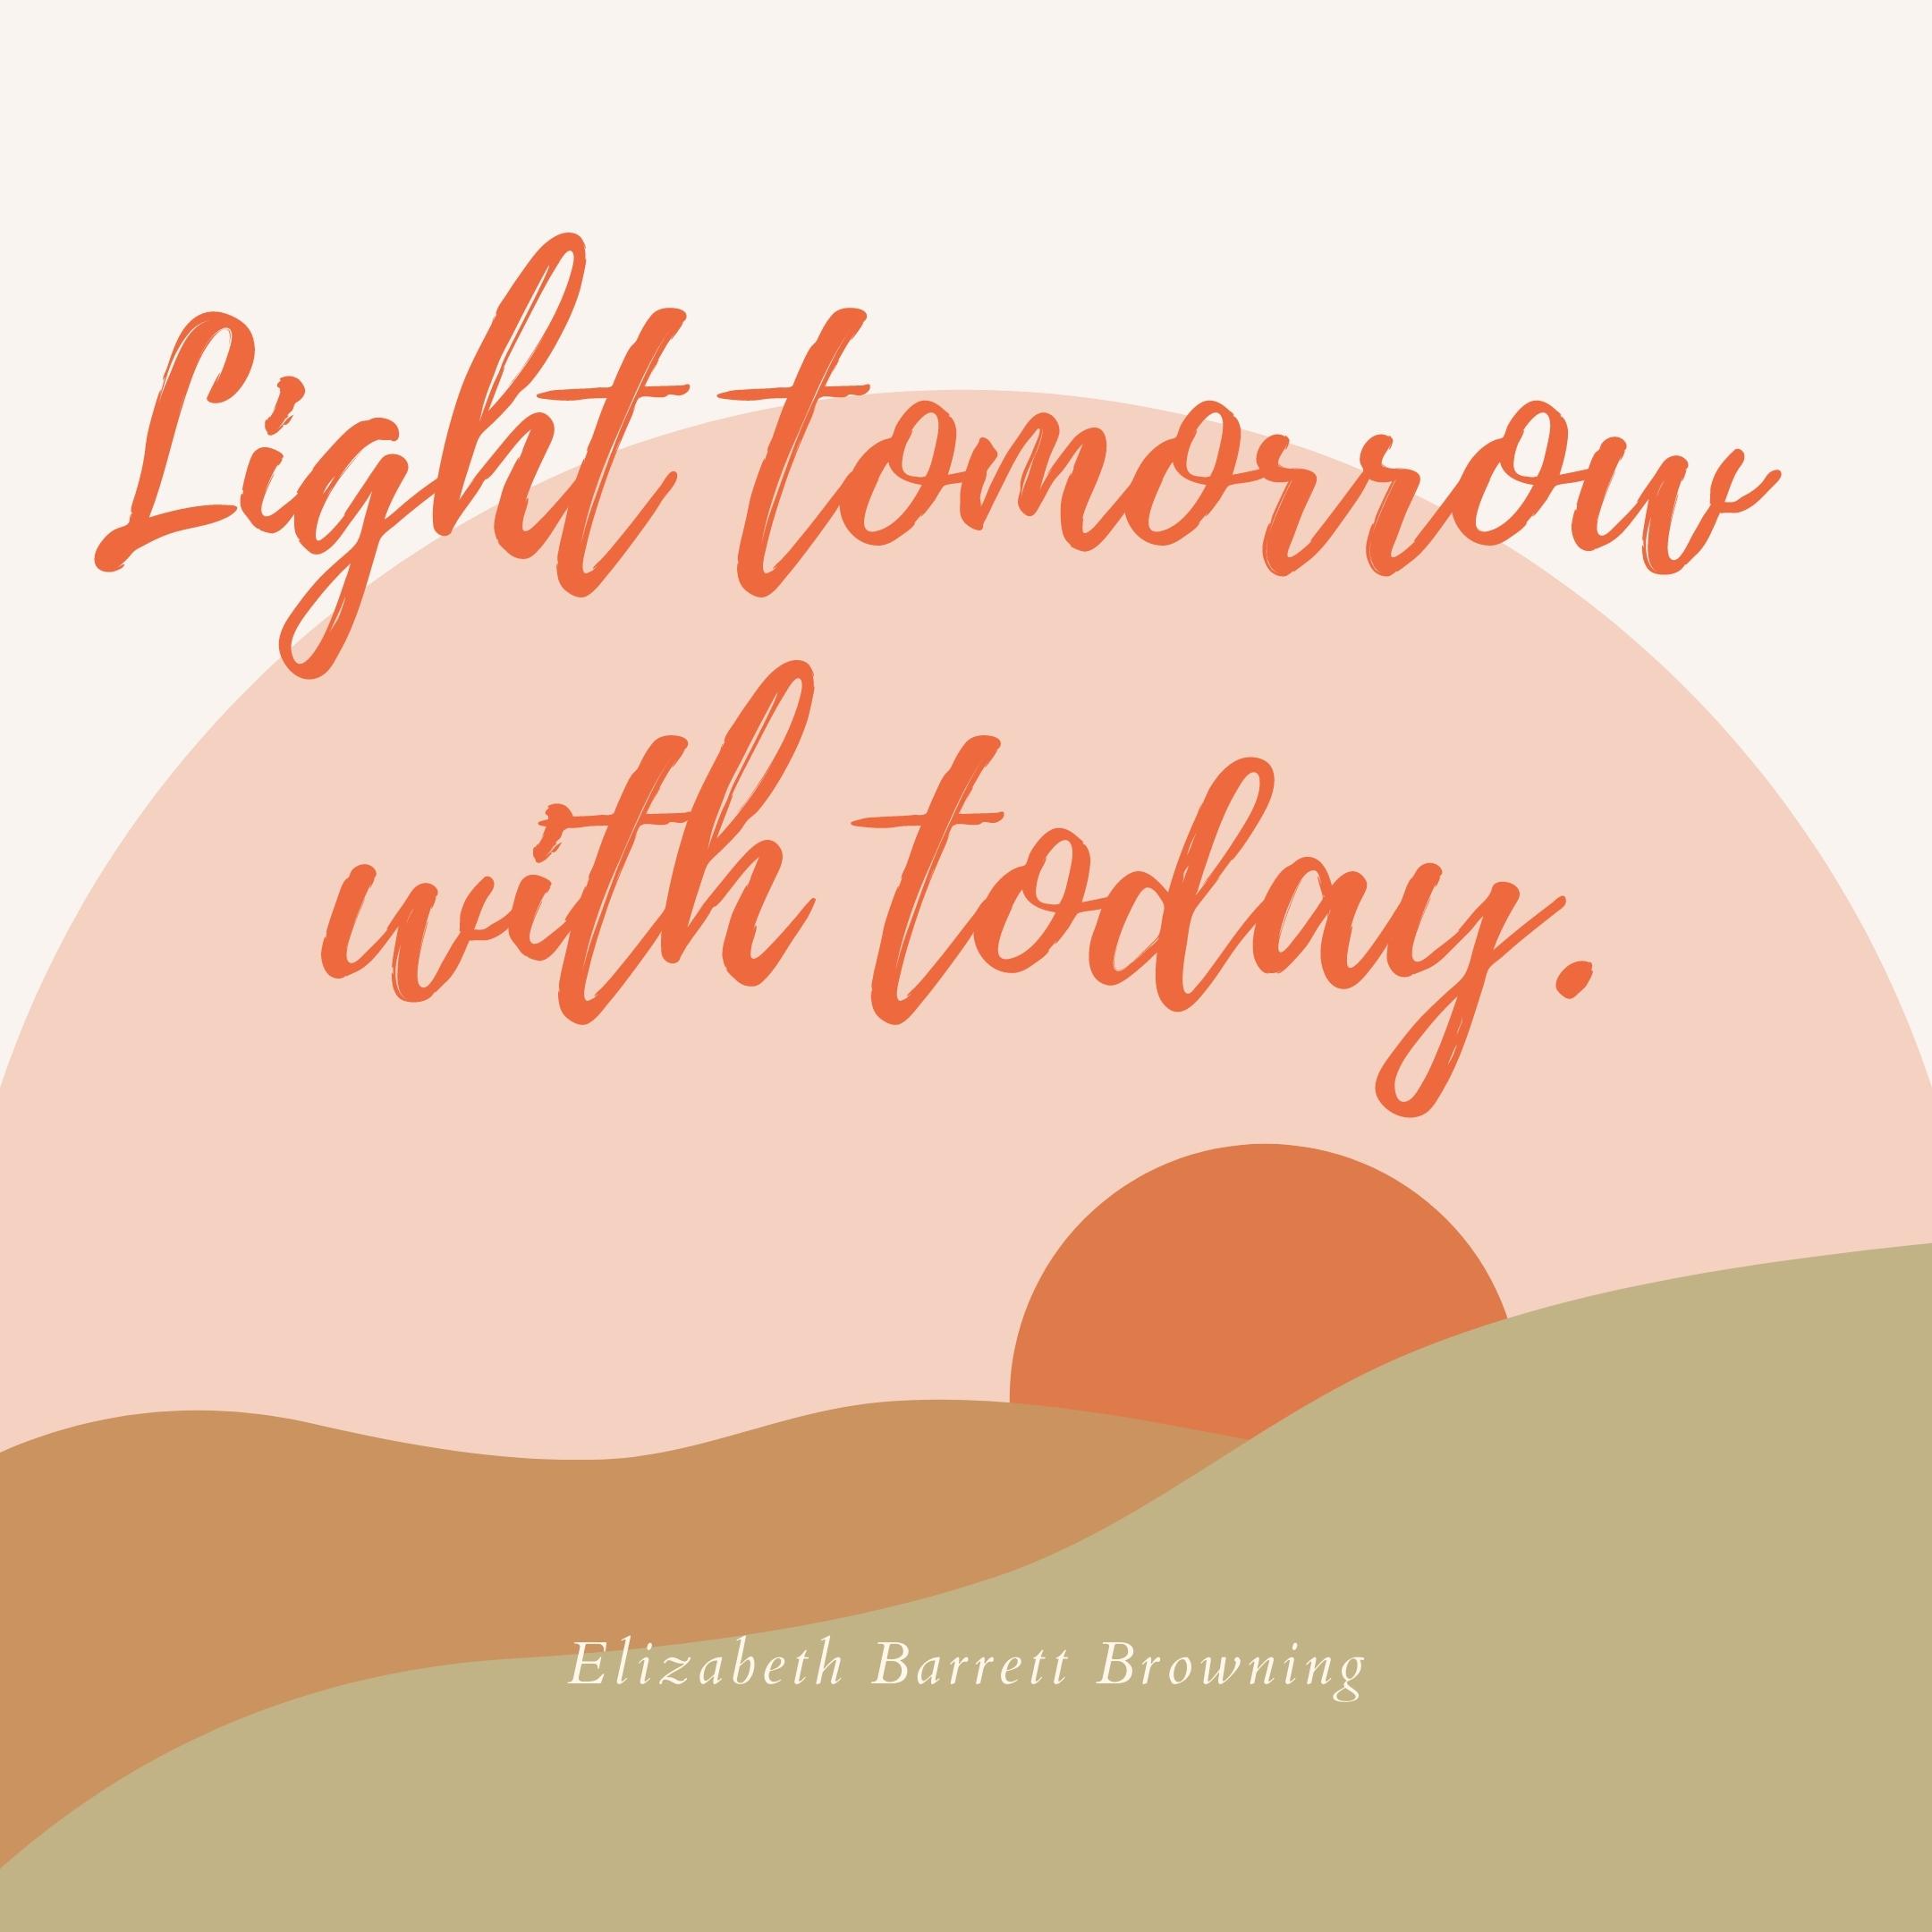 elizabeth barrett browning quote   daily motivation